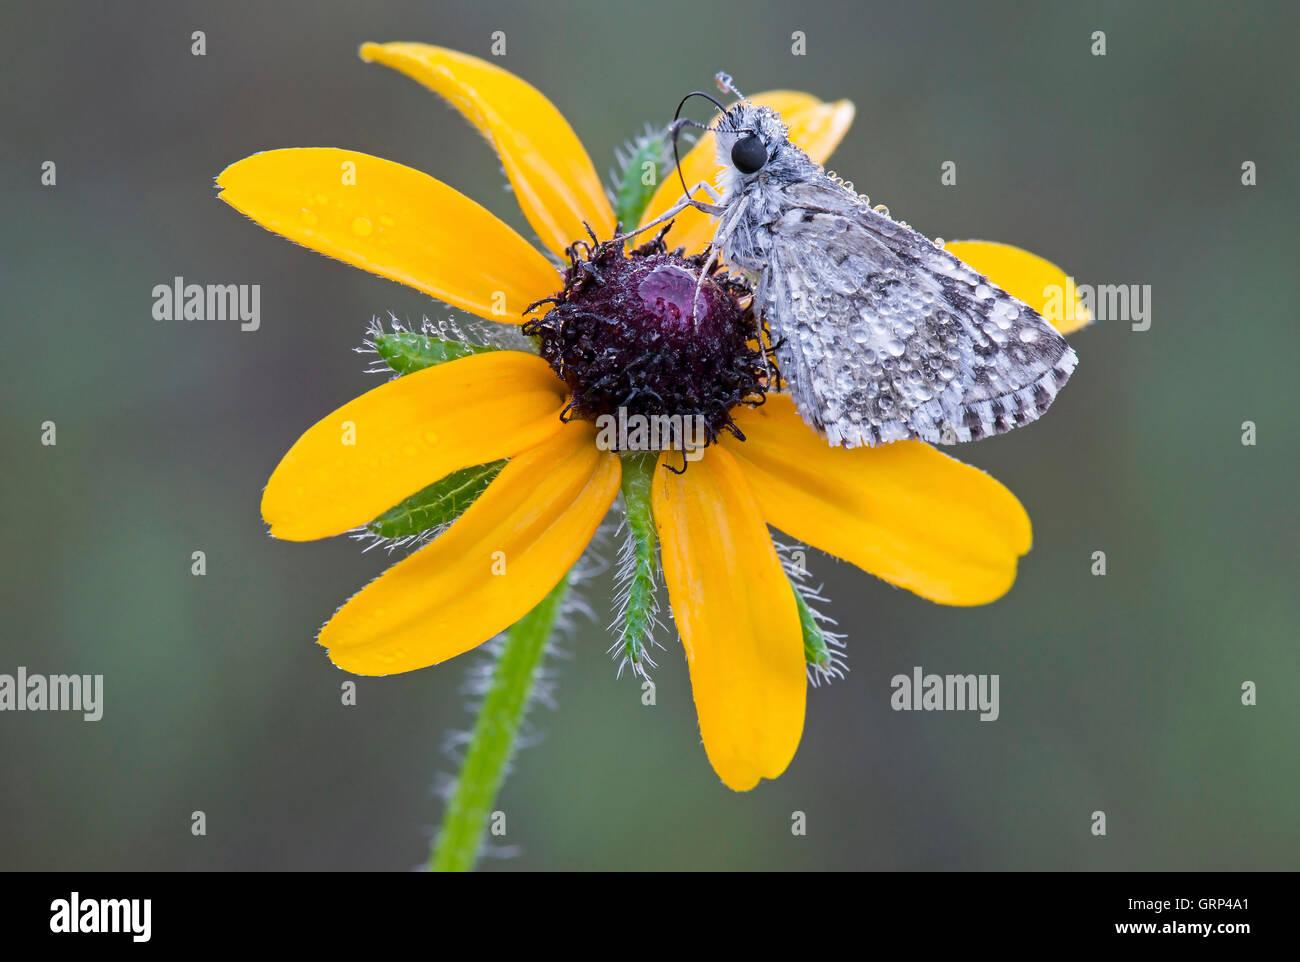 Rugiadoso comune Skipper a scacchi Butterfly (Pyrgus communis) nectaring, alimentando il black-eyed Susan (Rudbeckia Immagini Stock